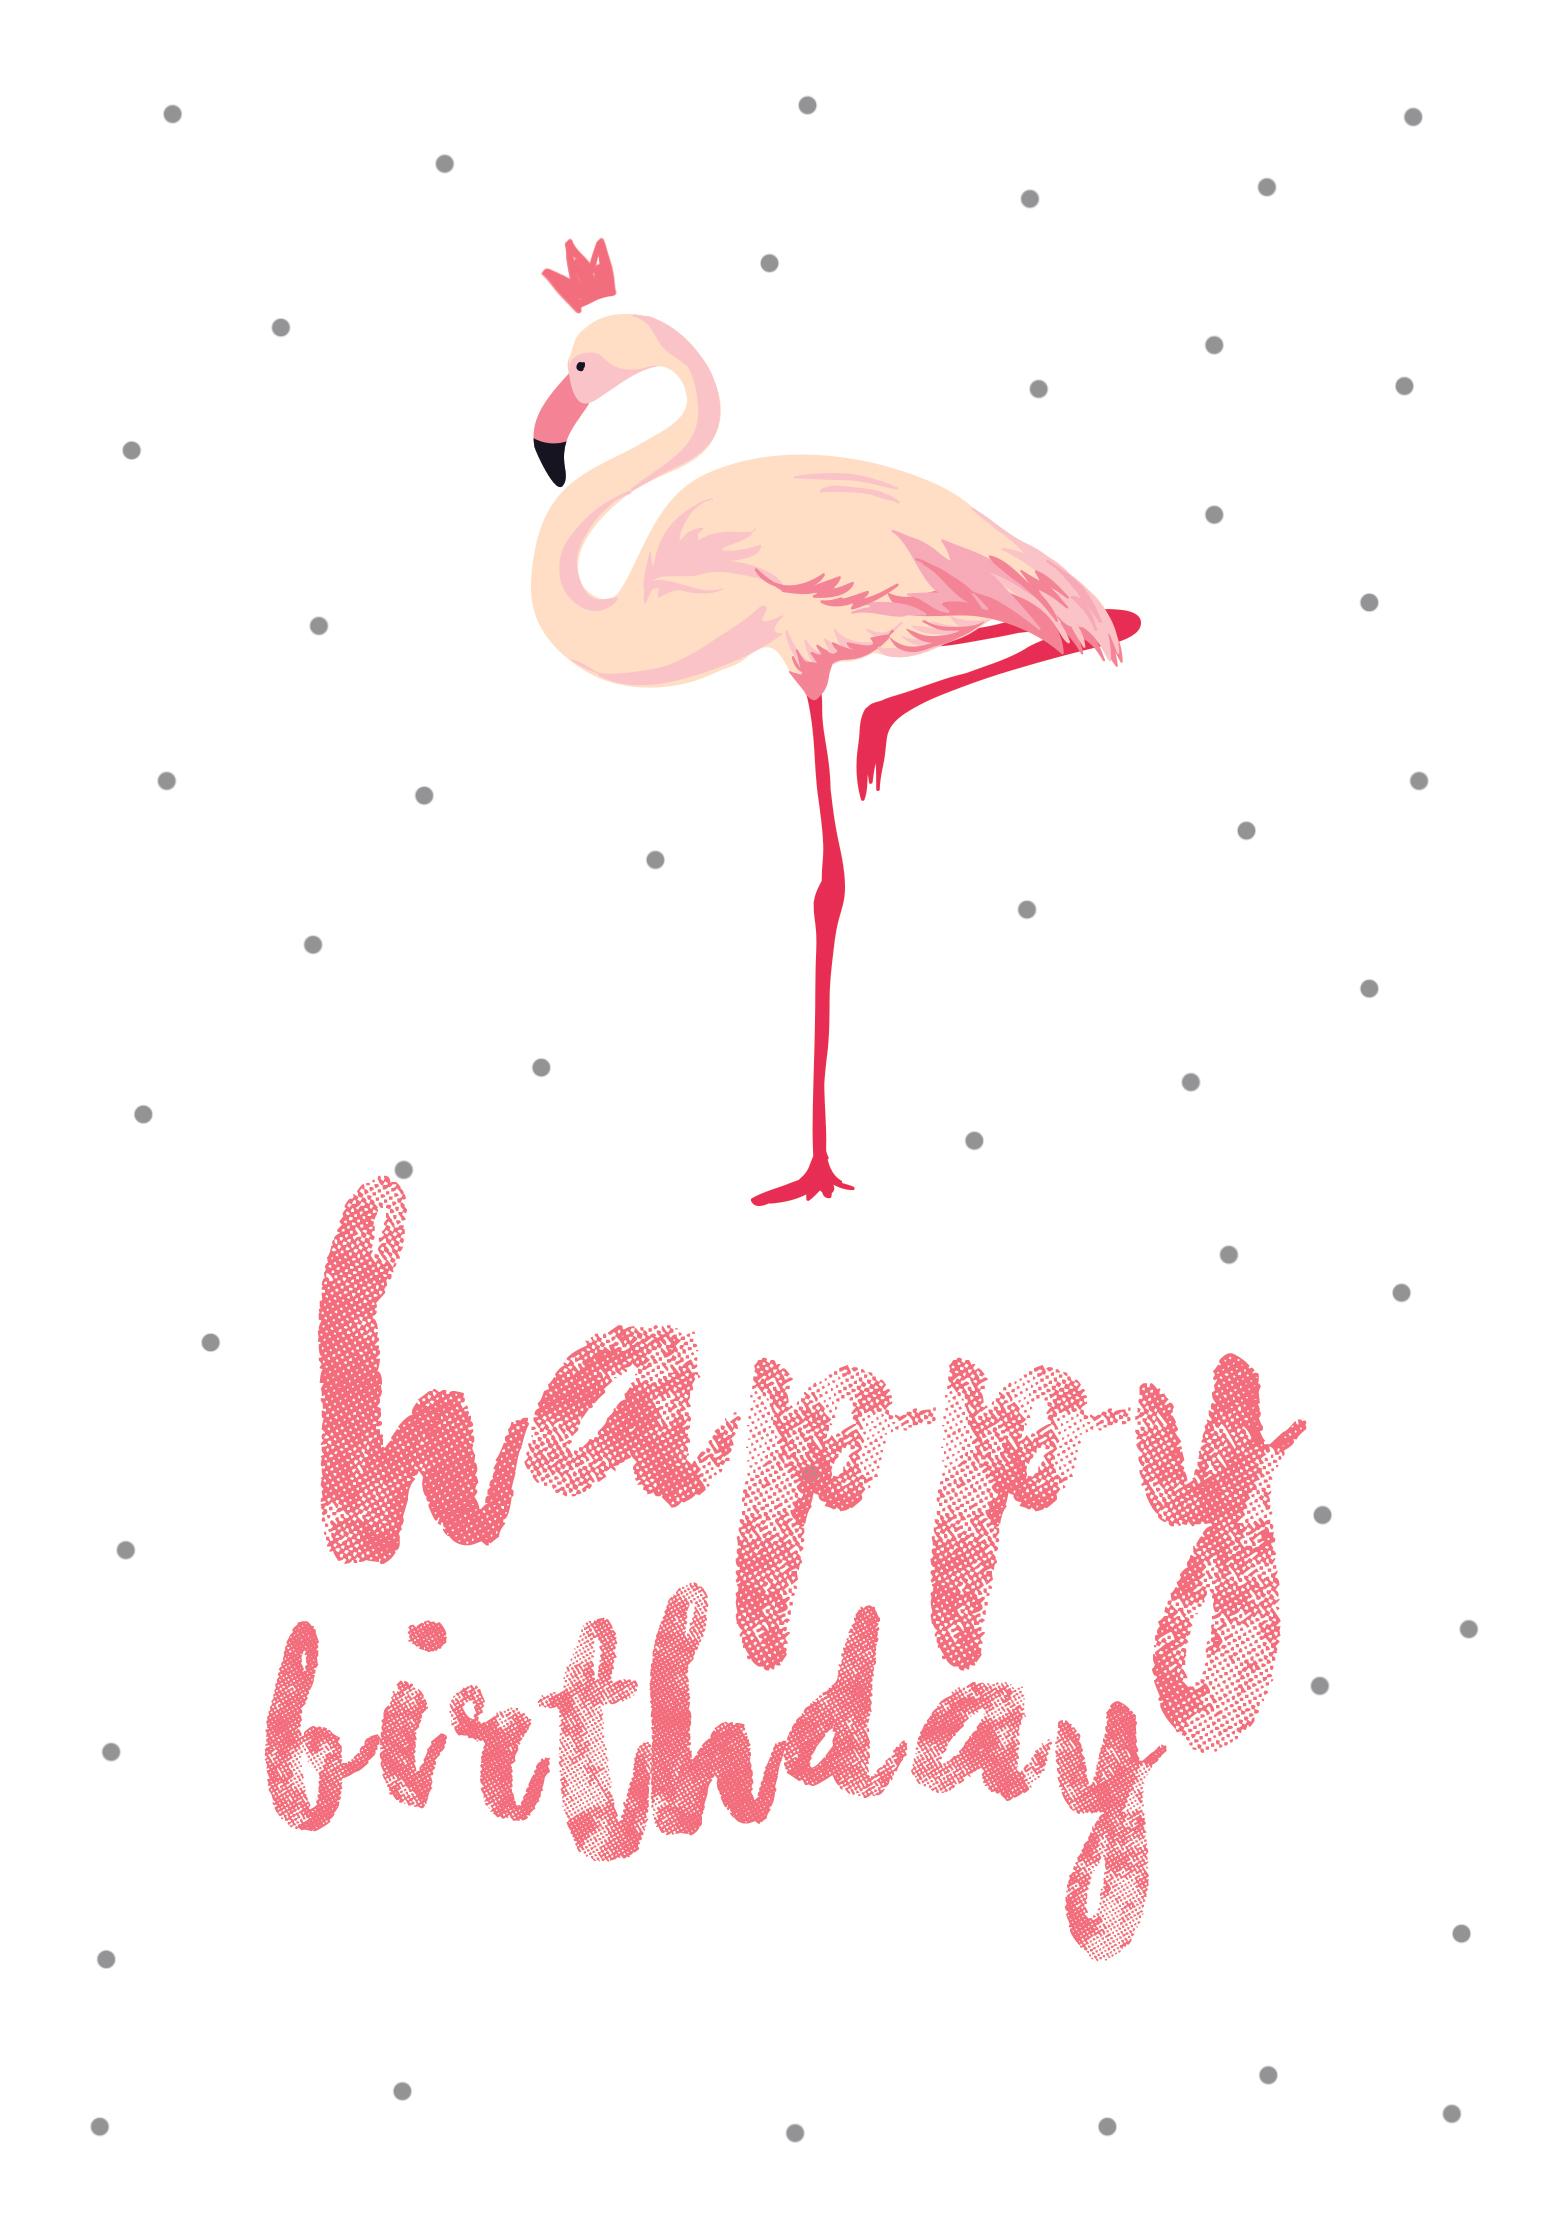 Flamingo Birthday - Free Printable Birthday Card | Greetings Island - Free Printable Bday Cards